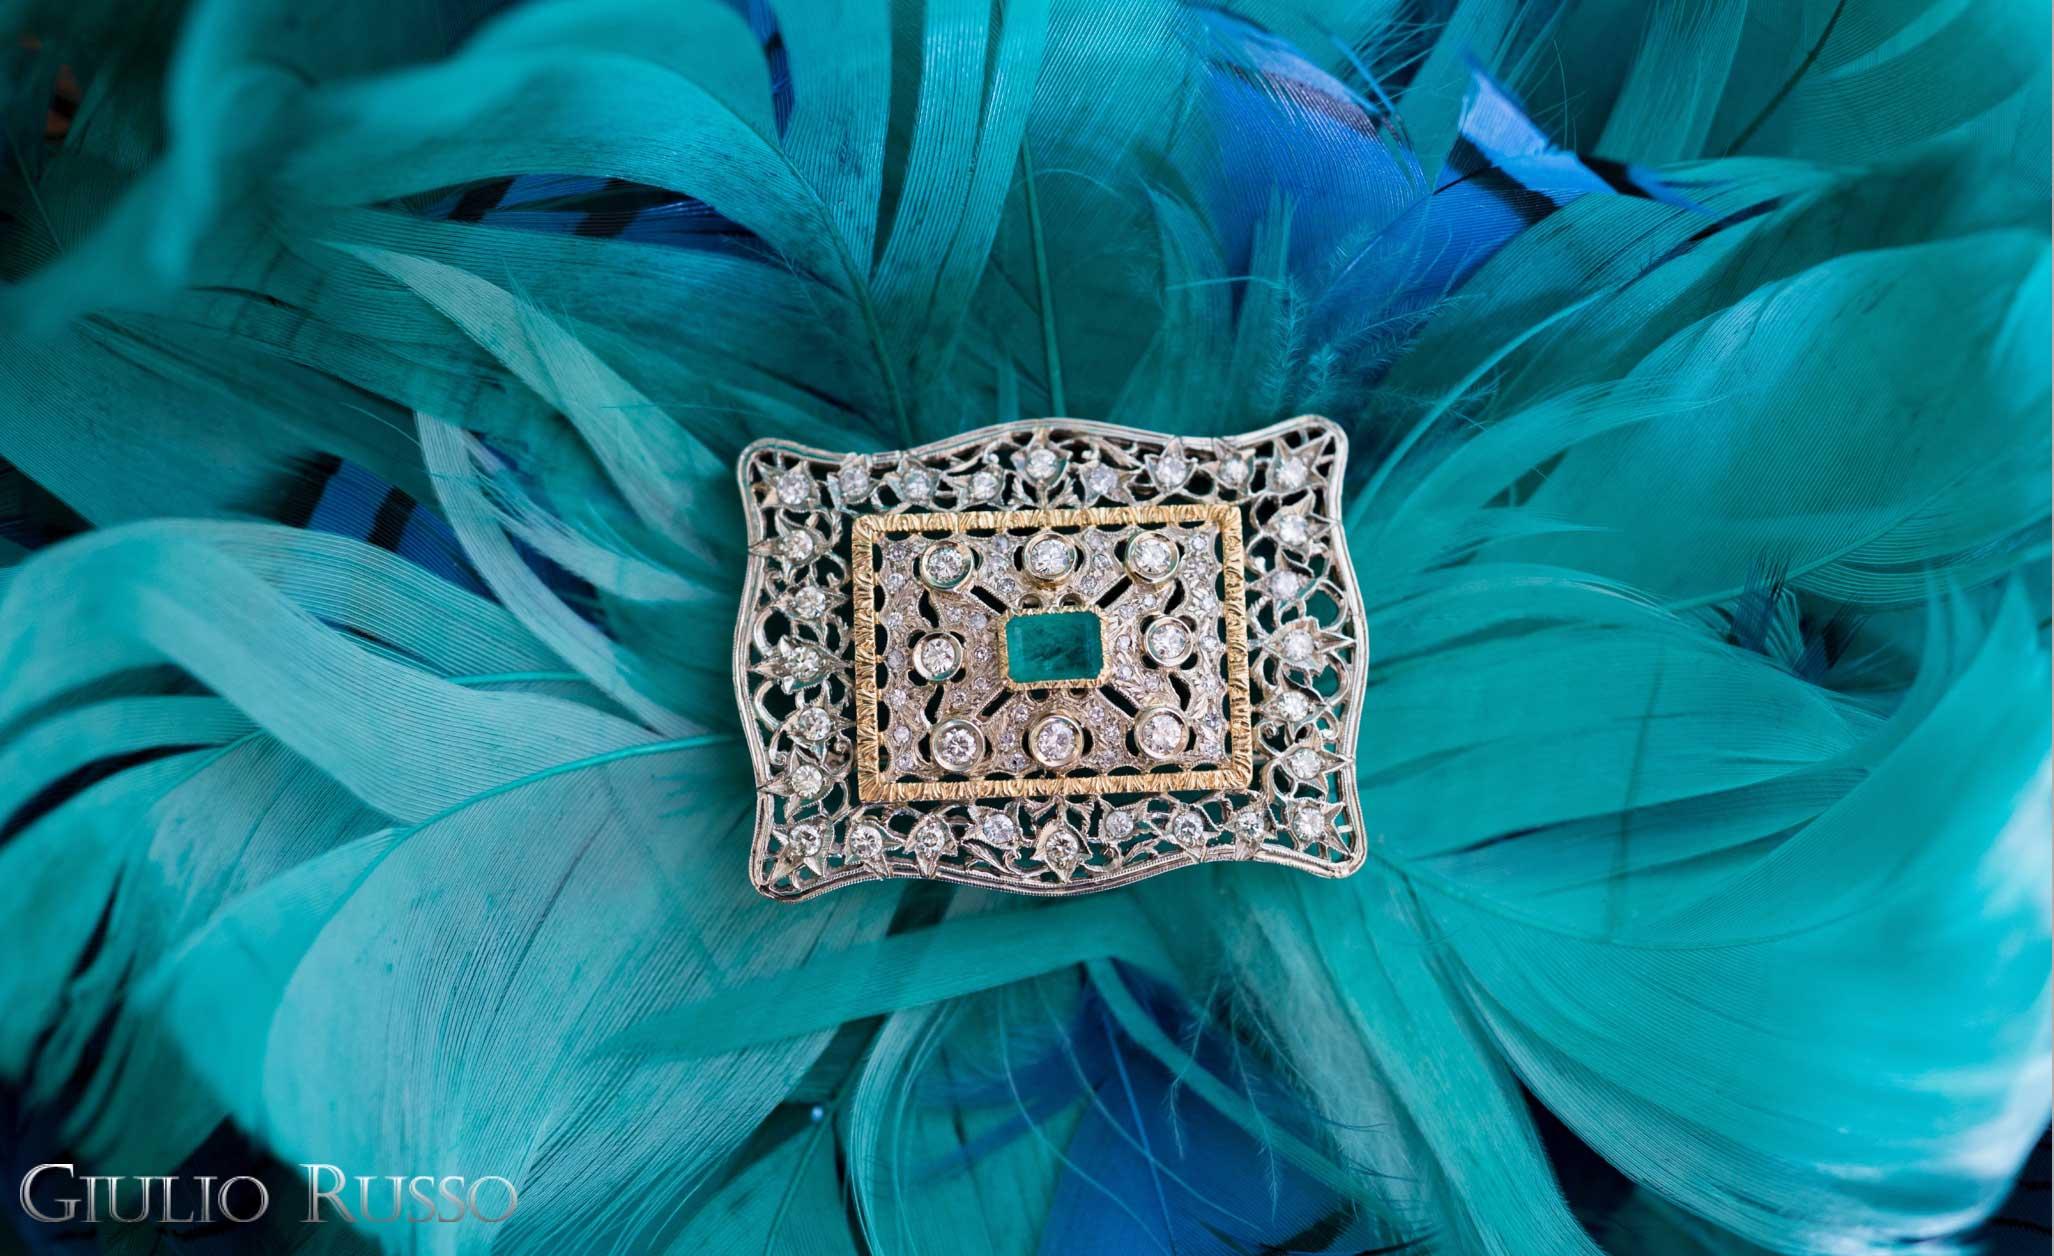 Giulio Russo jewellery